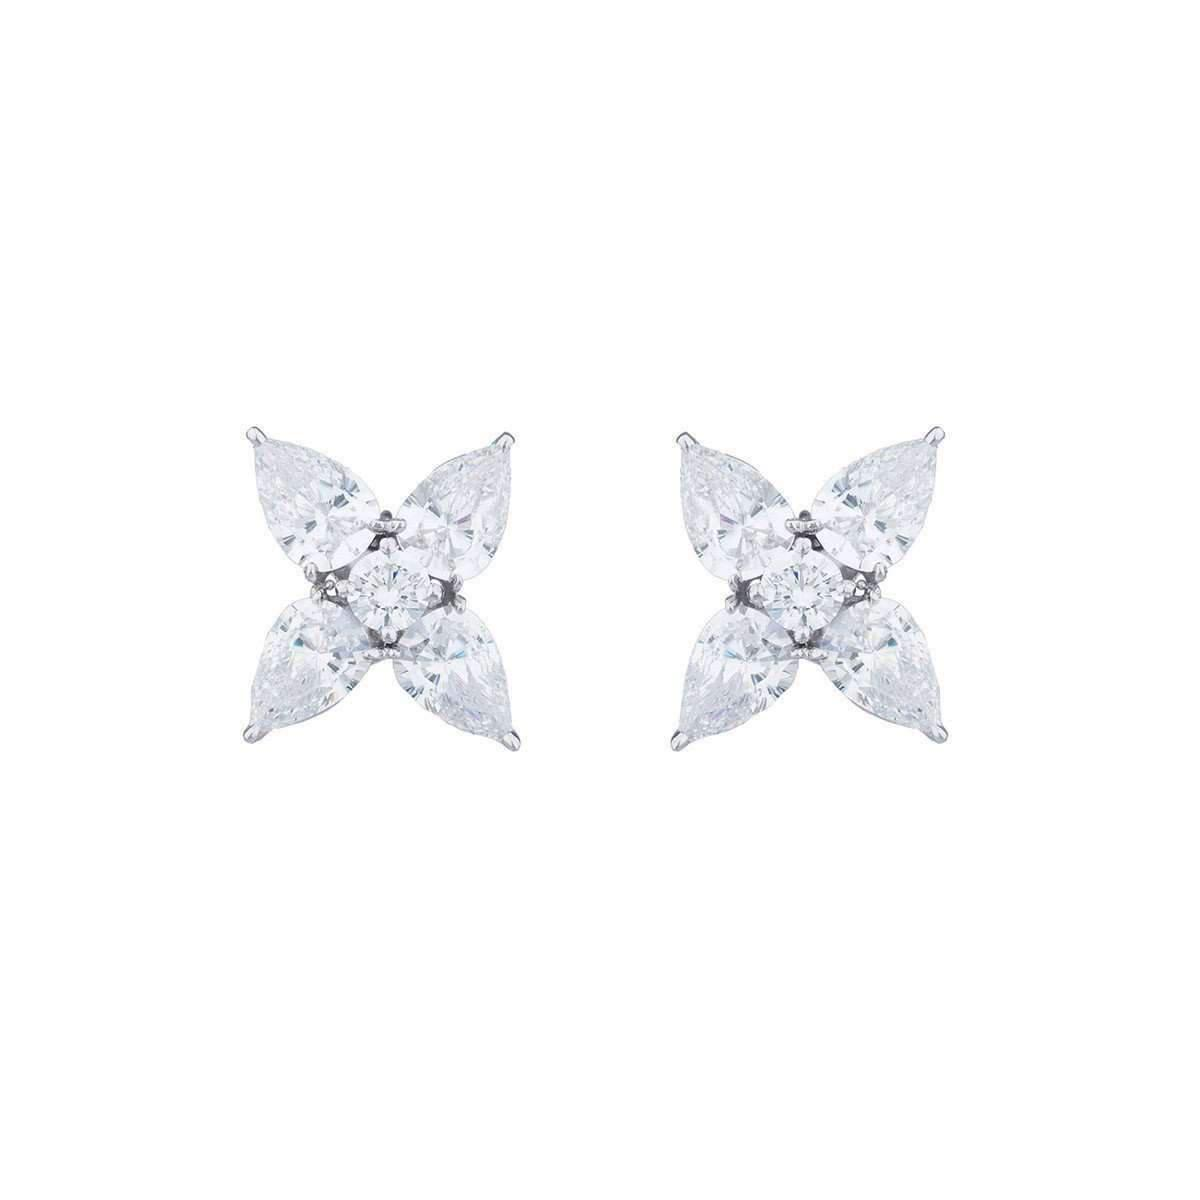 Fantasia Sterling Silver Marquise Cut Flower Button Earrings RplTvteQd